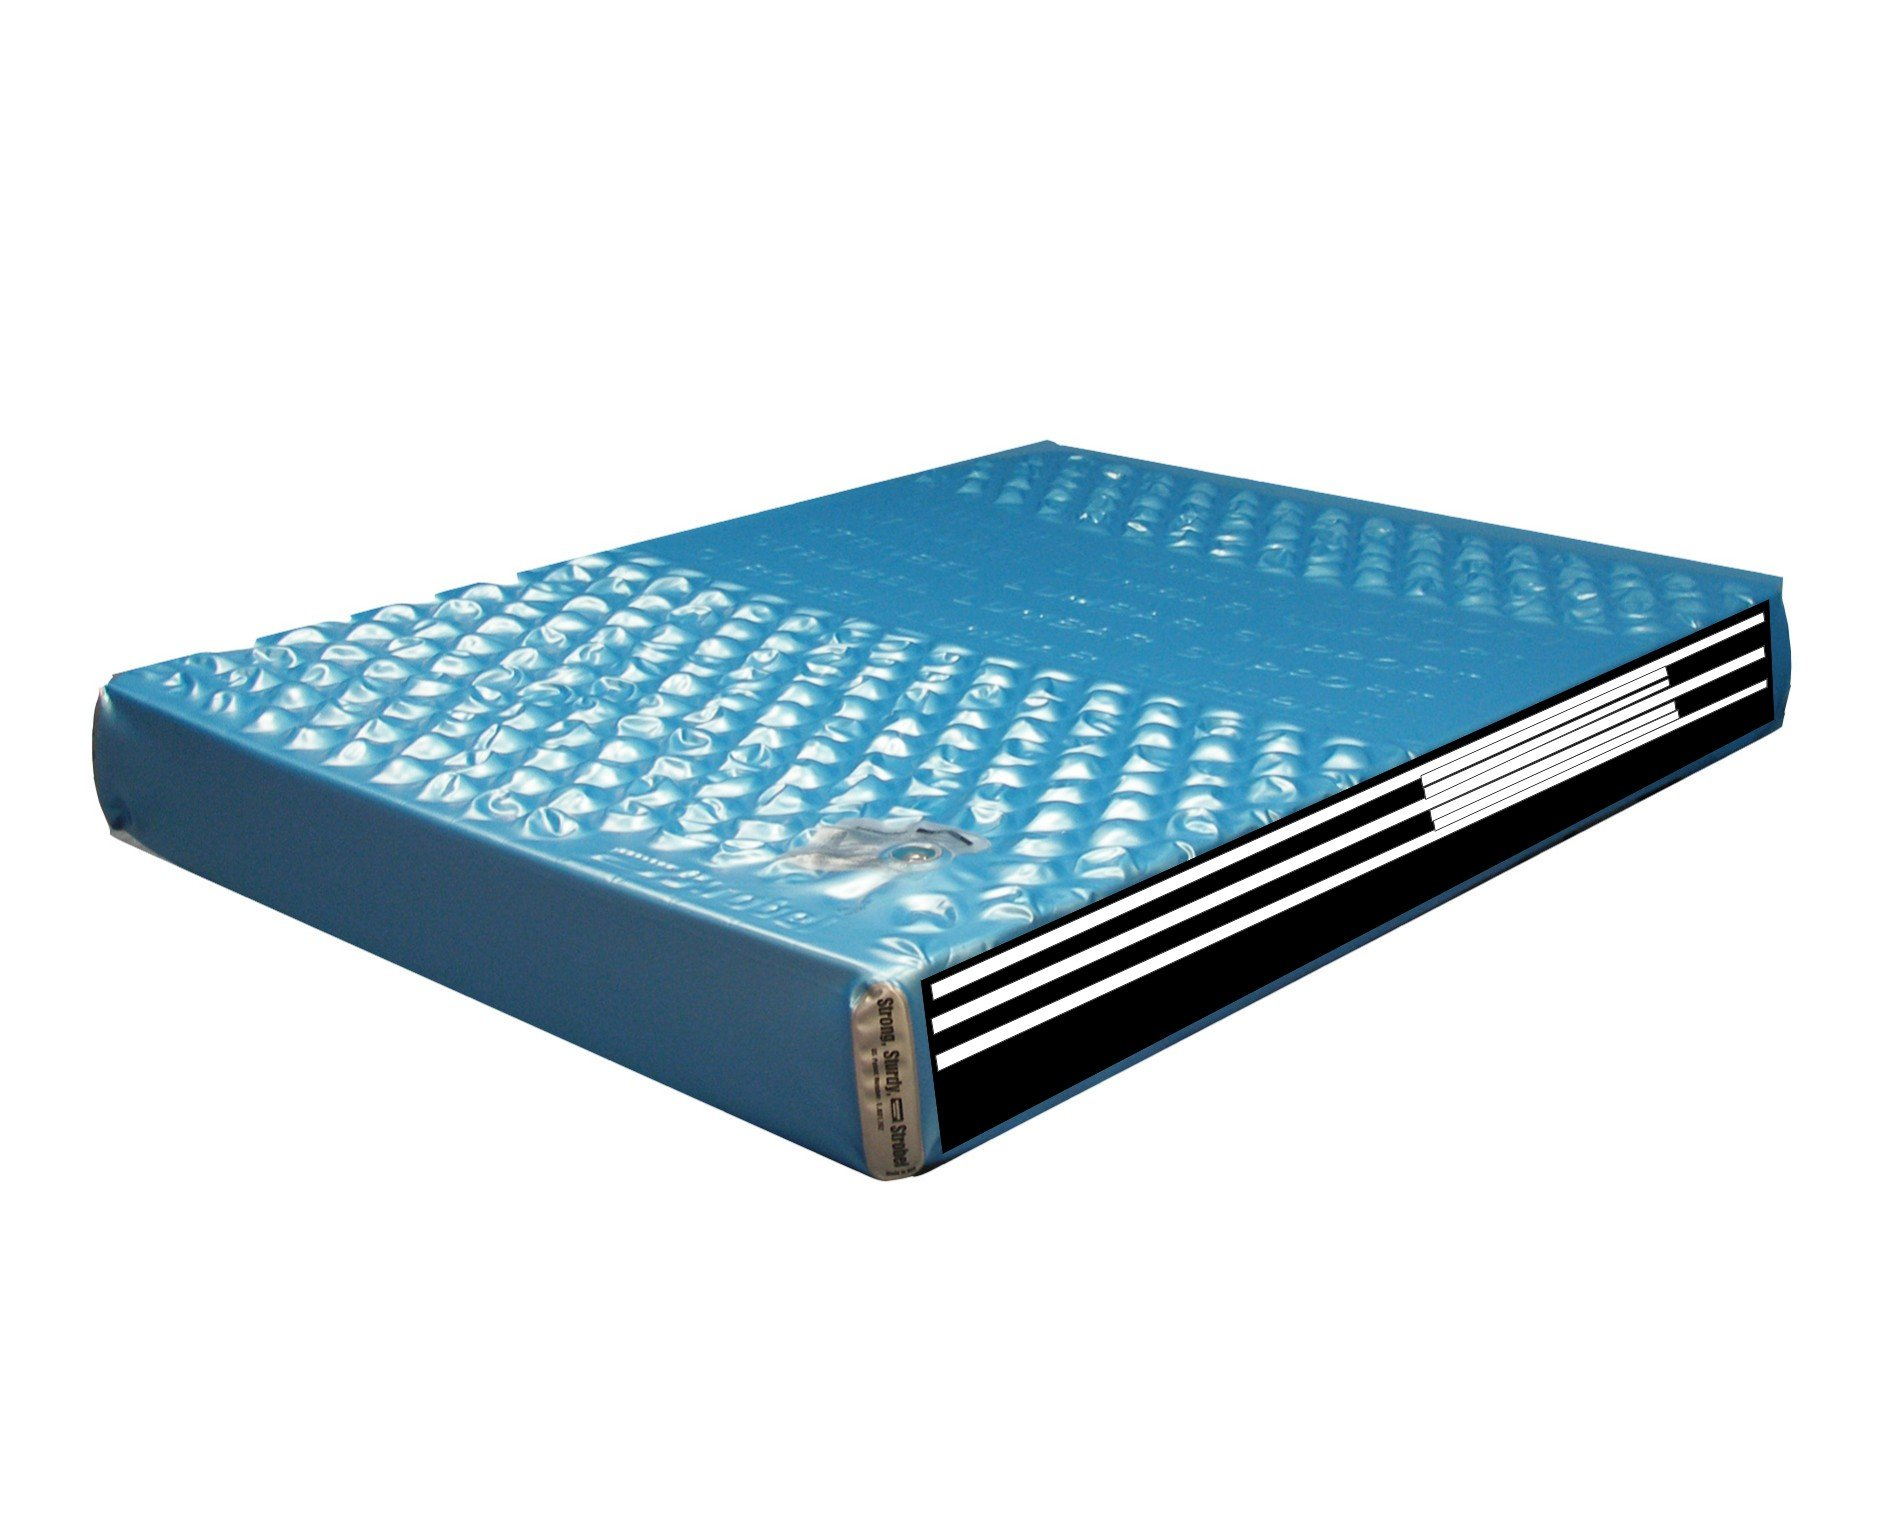 Strobel Organic Waterbed Mattress Hydro-Support 1400 King